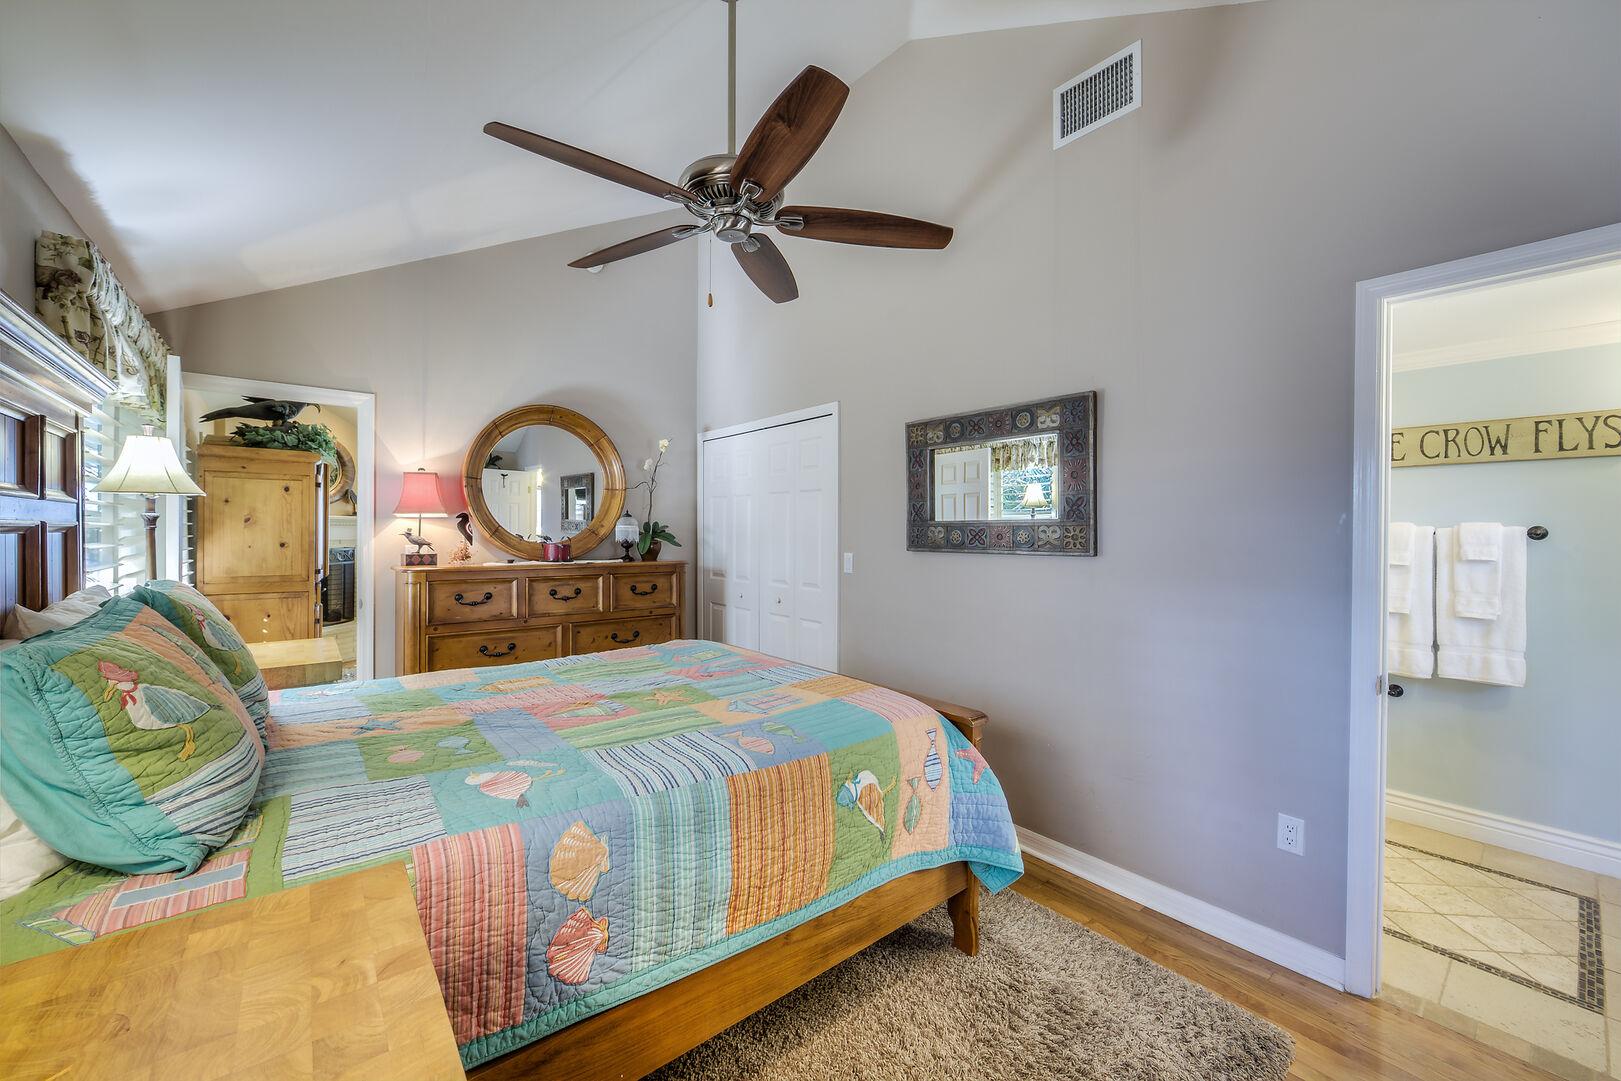 Fort Myers Beach Rental Bedroom with Hardwood Flooring